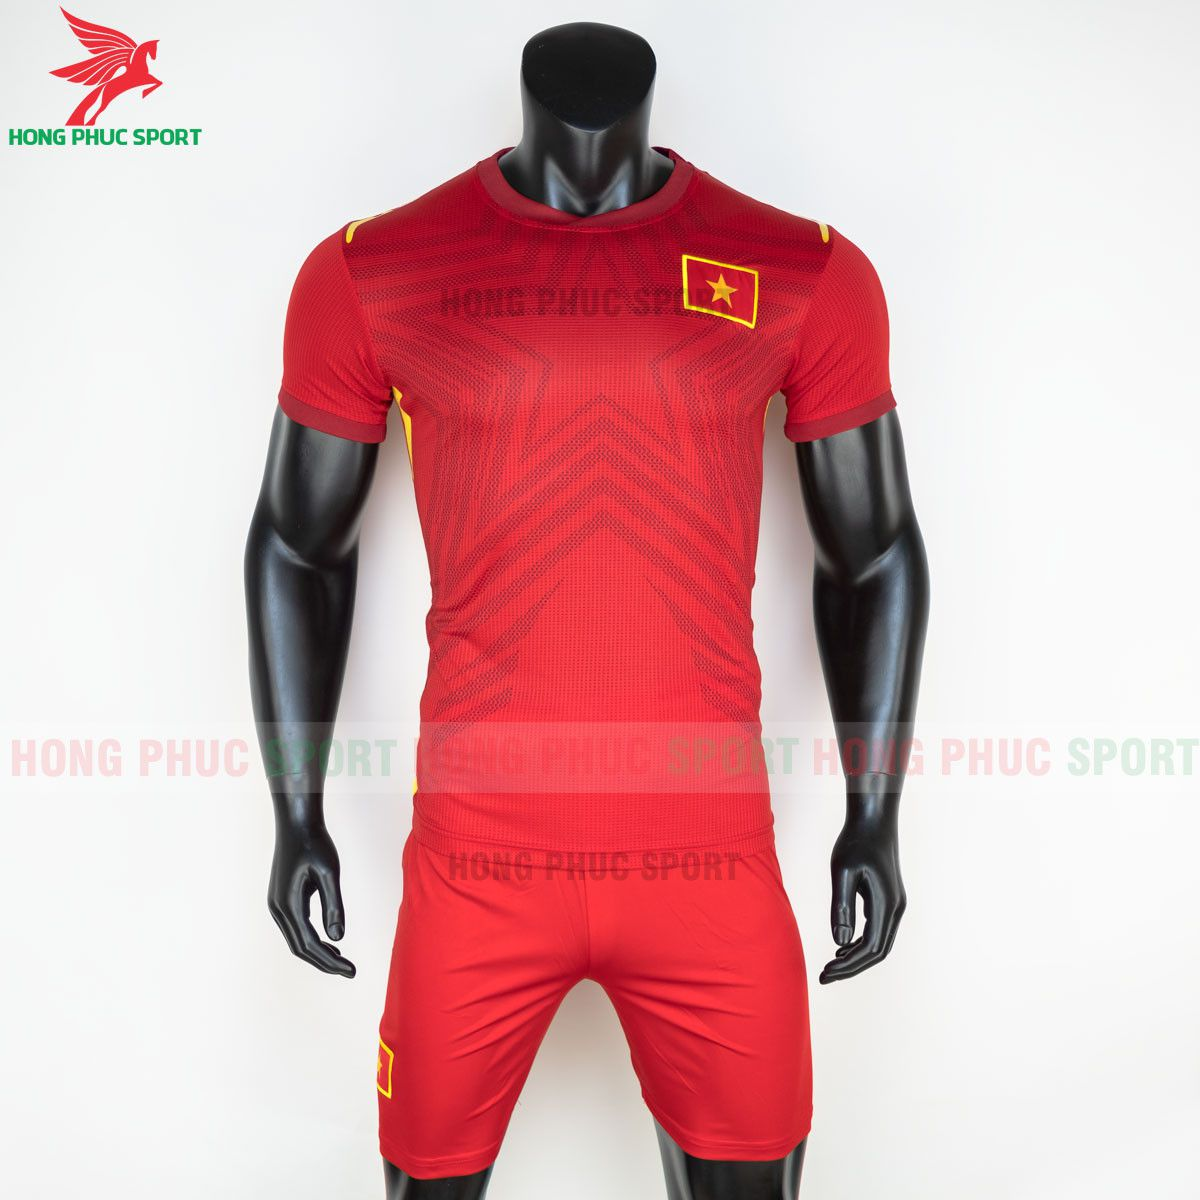 https://cdn.hongphucsport.com/unsafe/s4.shopbay.vn/files/285/ao-bong-da-tuyen-viet-nam-2021-san-nha-hang-thai-2-60d30ffb71ae3.jpg